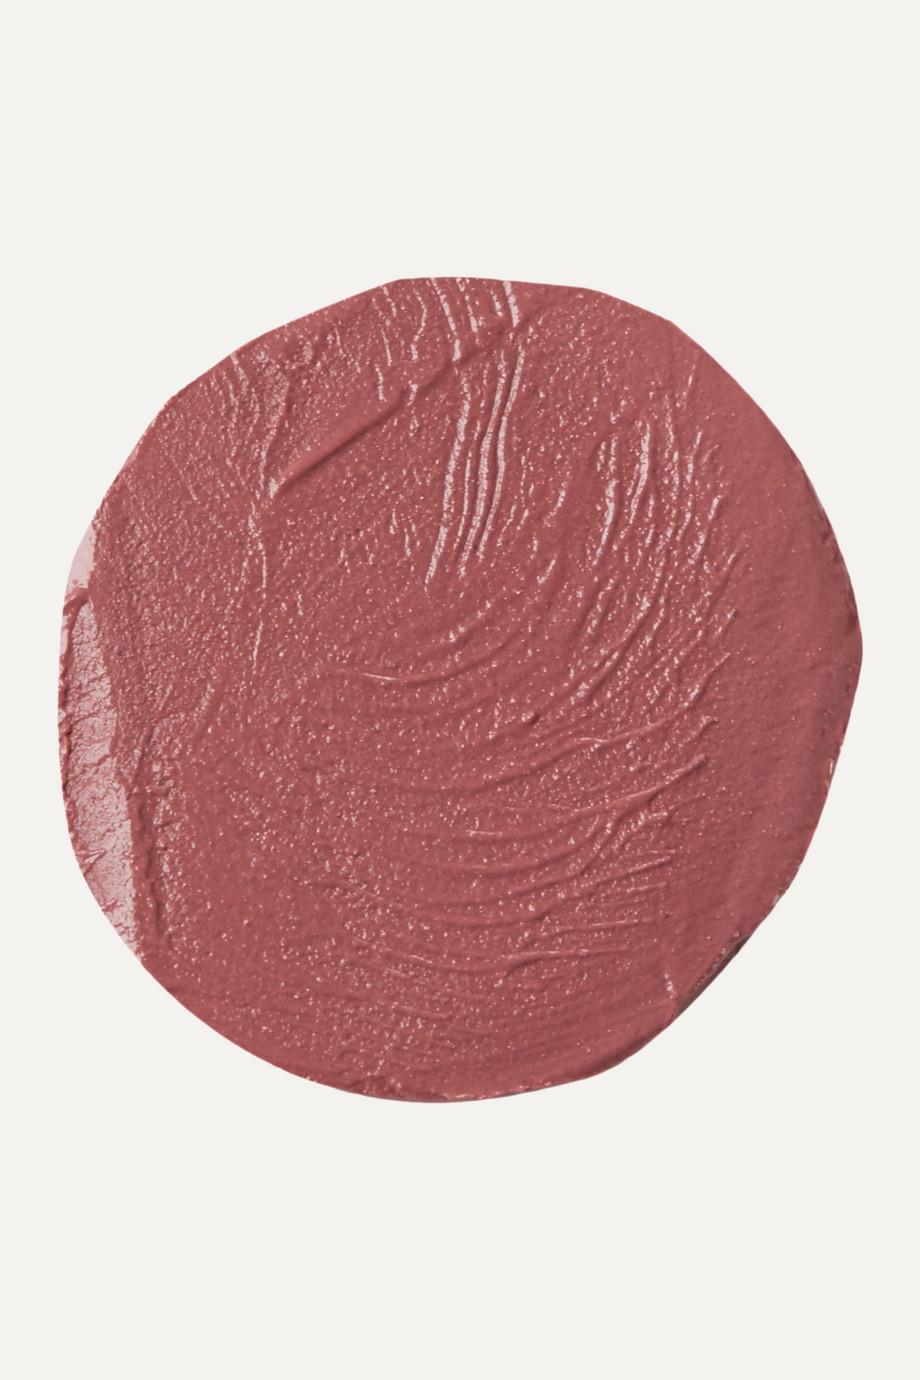 Code8 Color Brilliance Lipstick - The Met